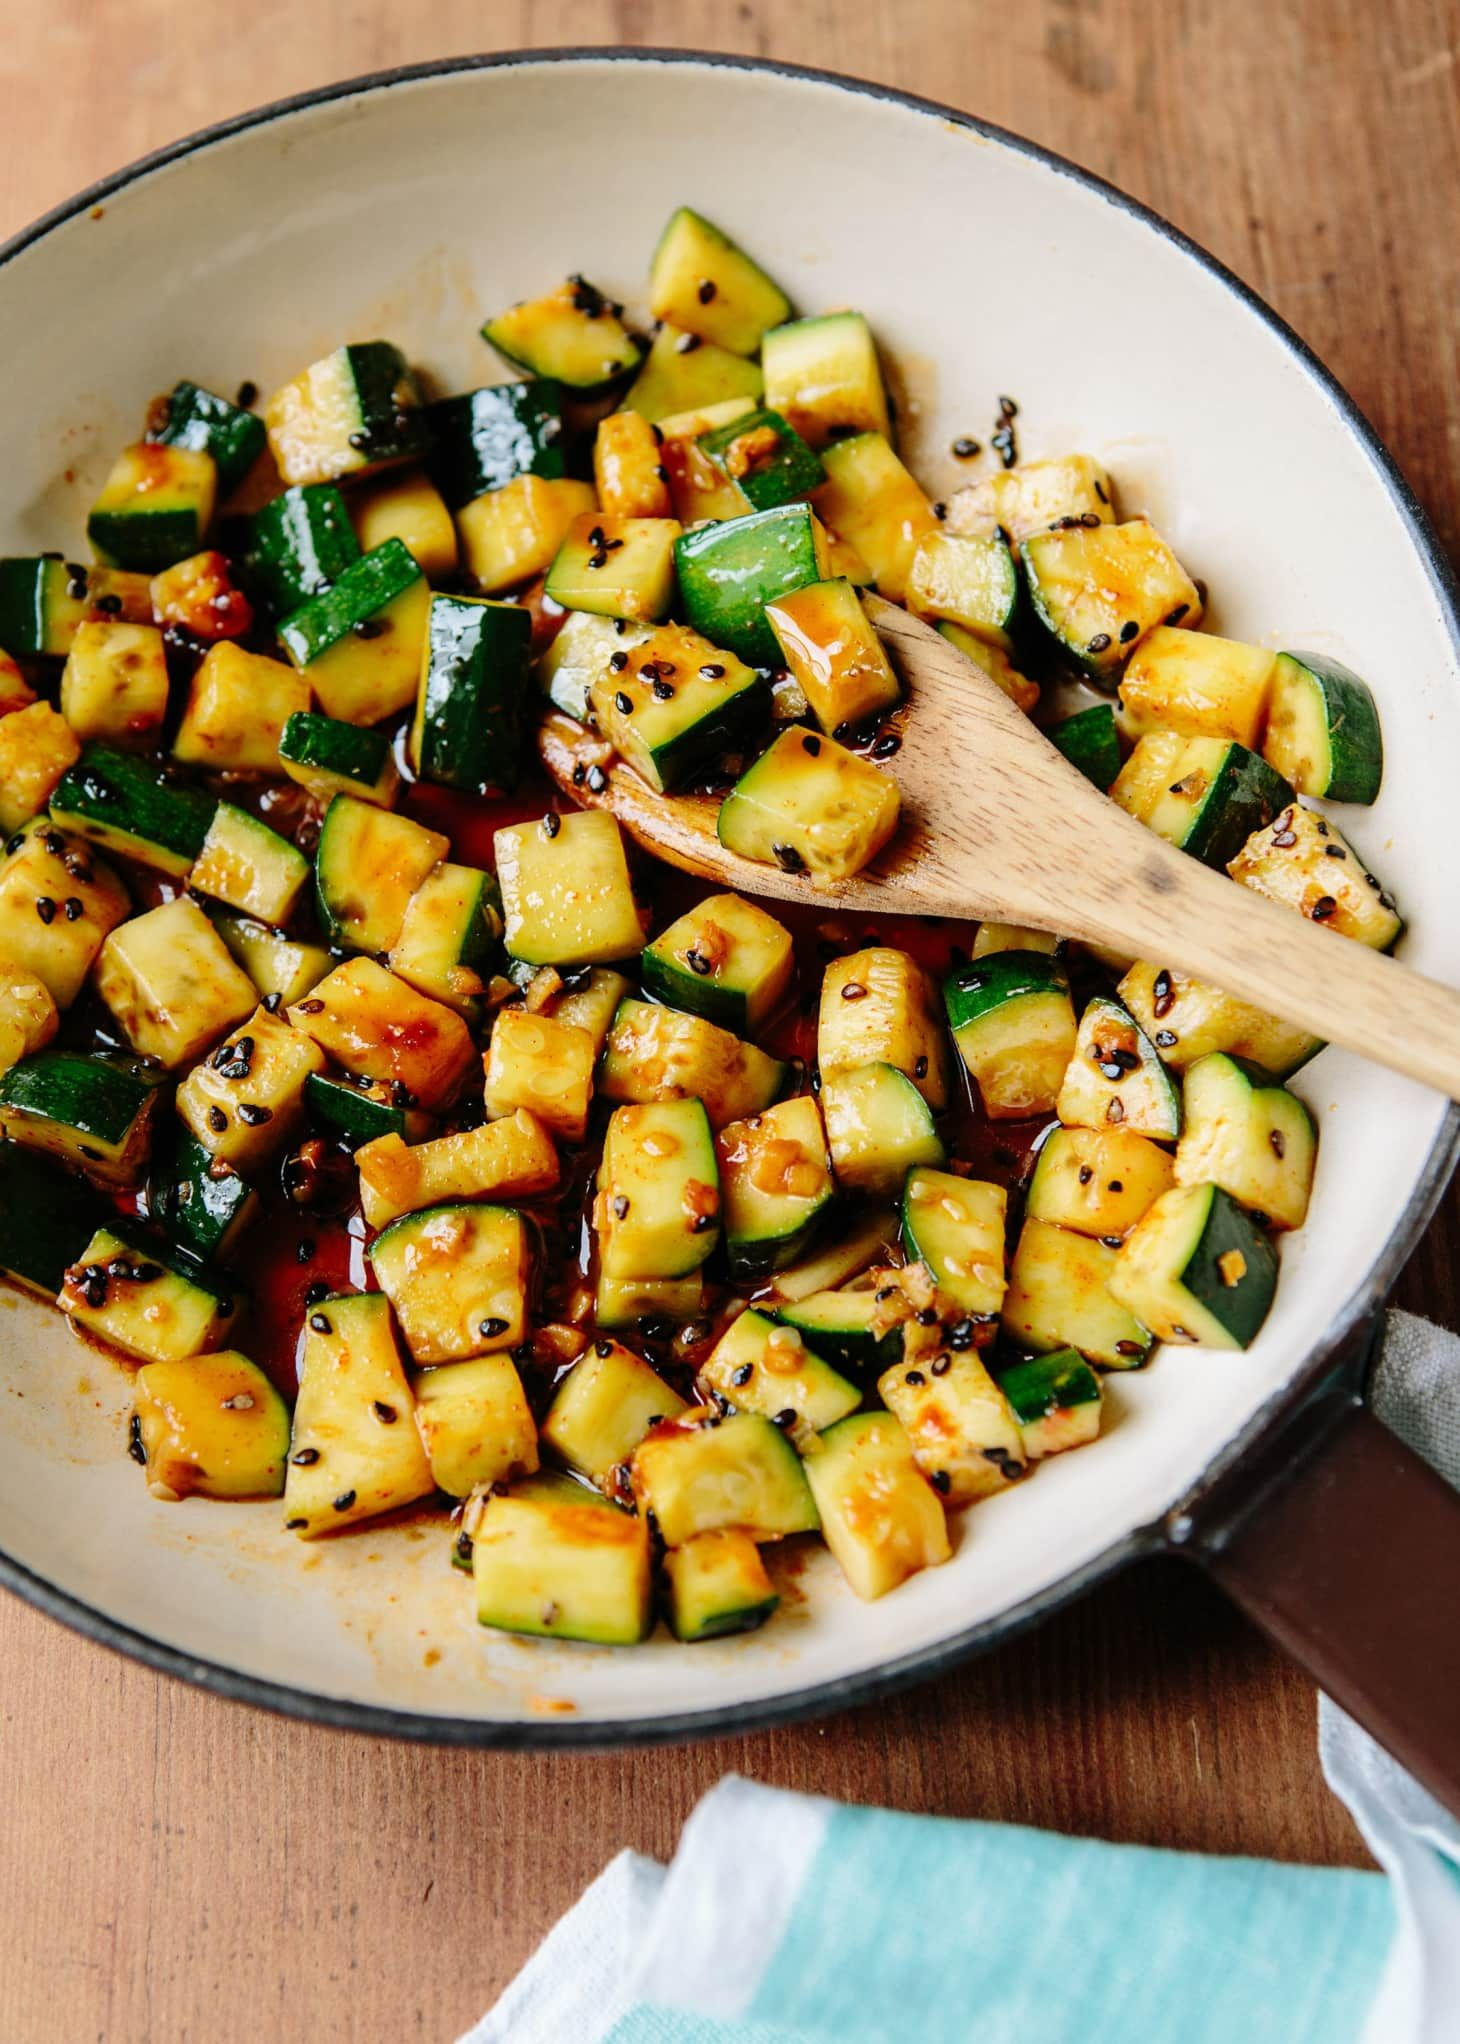 Michael Natkin S Spicy Stir Fried Zucchini Recipe With Images Skinny Taste Recipes Fried Vegetable Recipes Vegetable Recipes